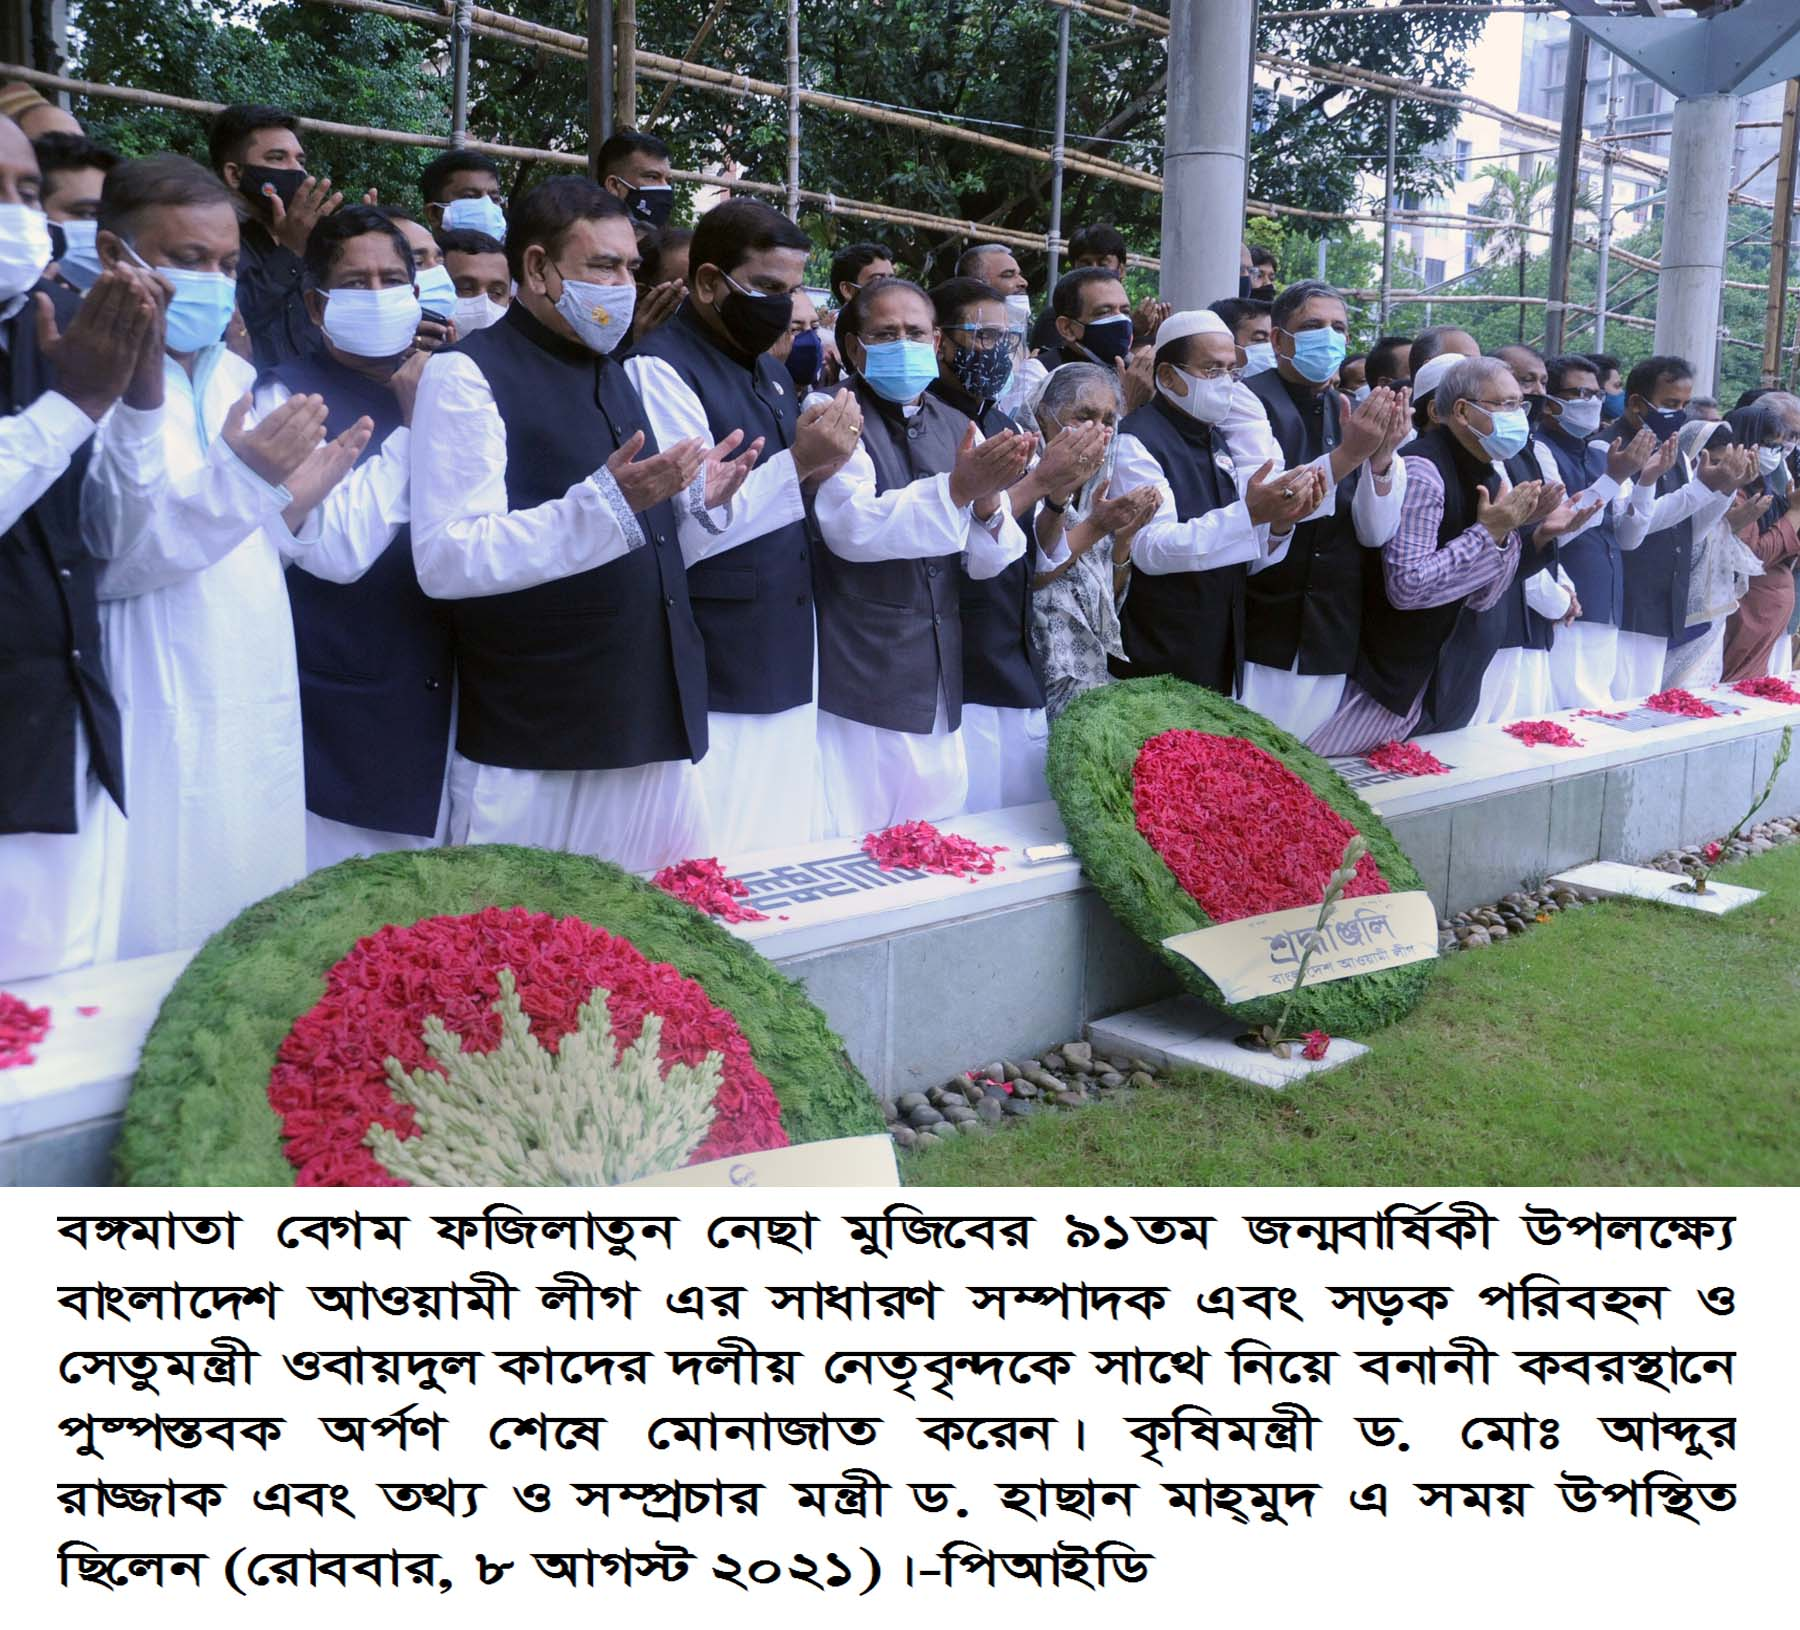 Bangamata's birth anniversary observed across Bangladesh